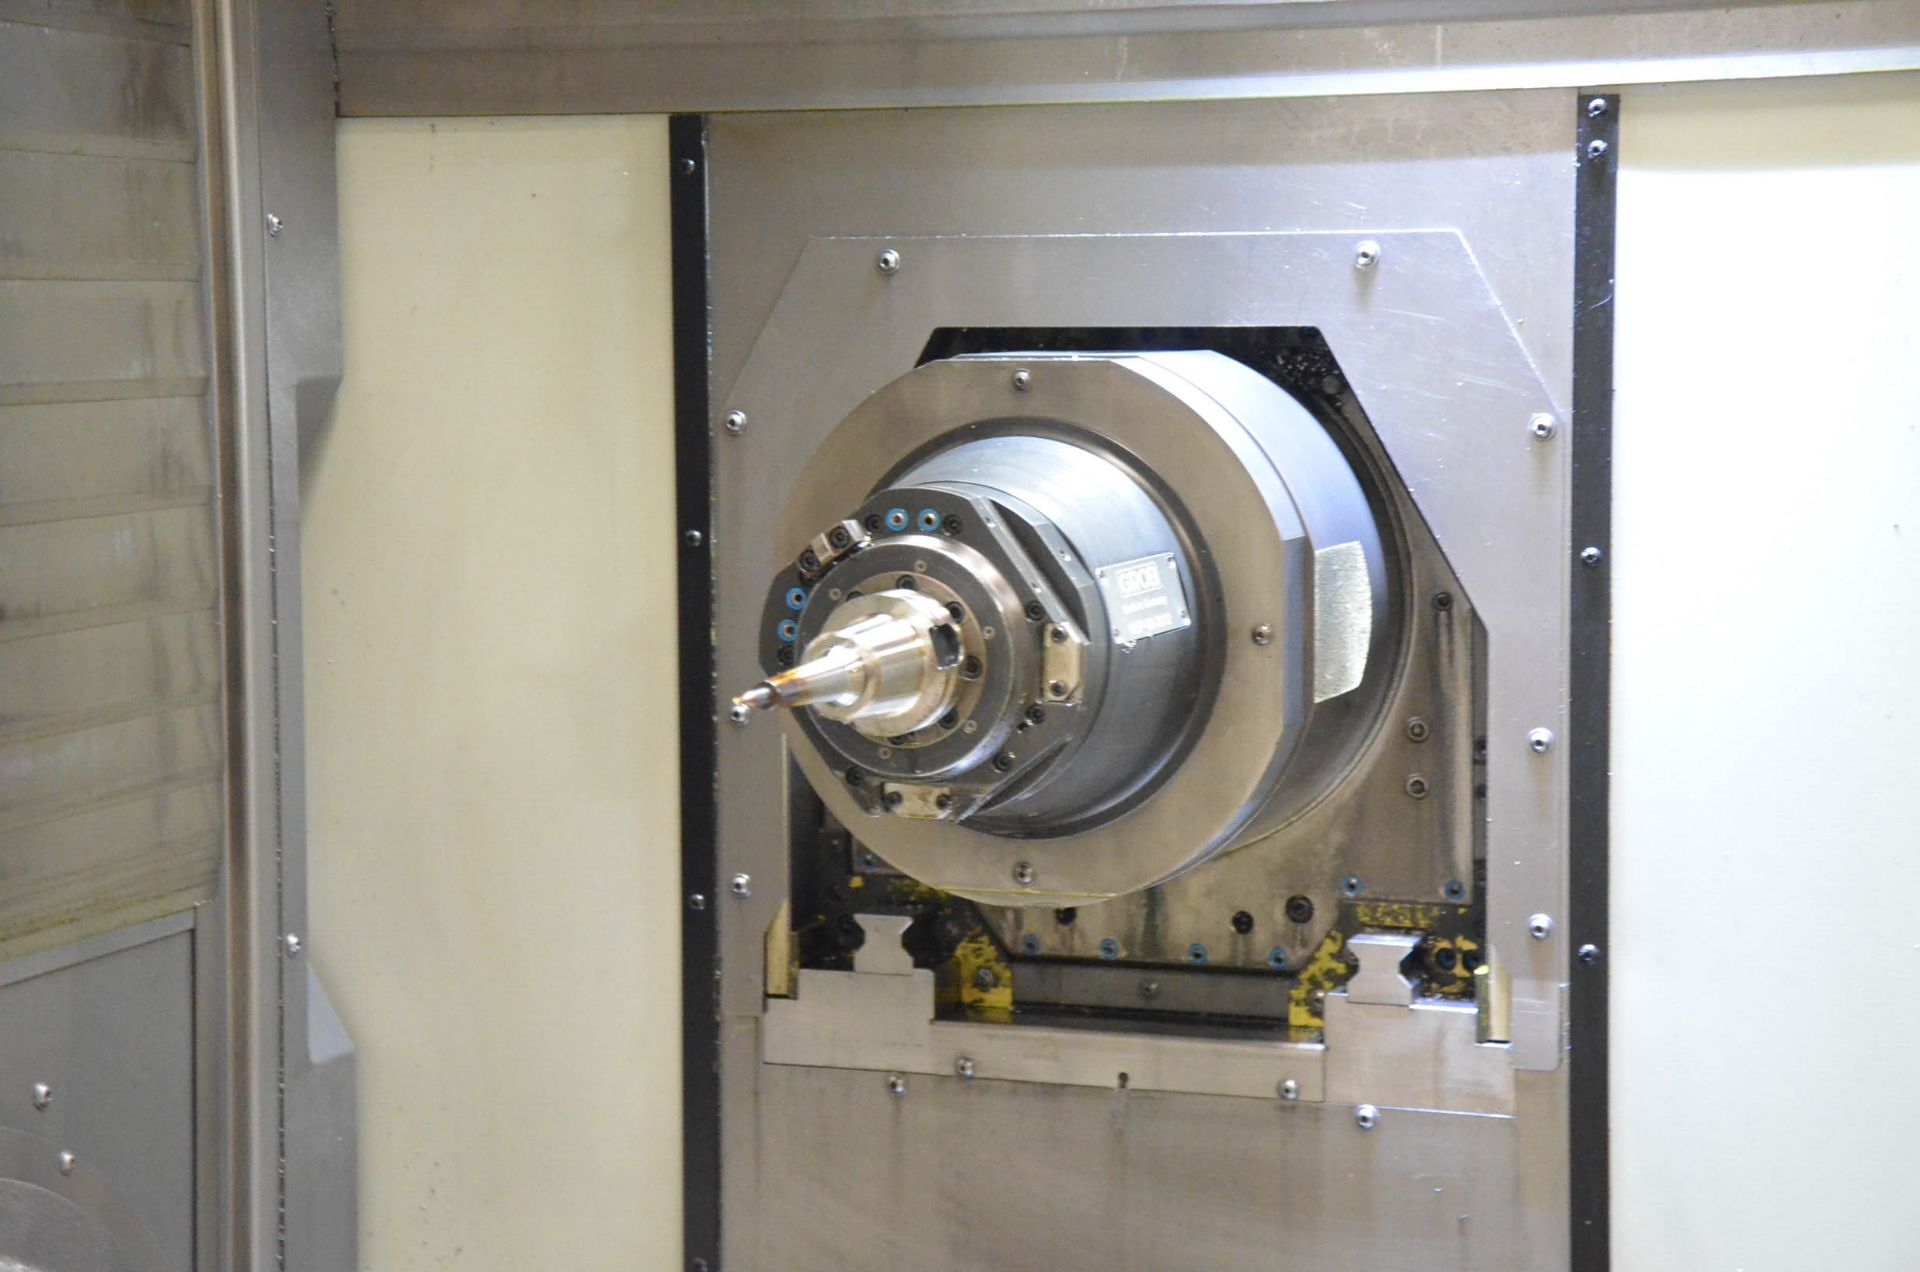 "GROB (2012) G350 5-AXIS CNC MACHINING CENTER WITH HEIDENHAIN ITNC 530 CNC CONTROL, 22.25"" DIAMETER - Image 6 of 12"